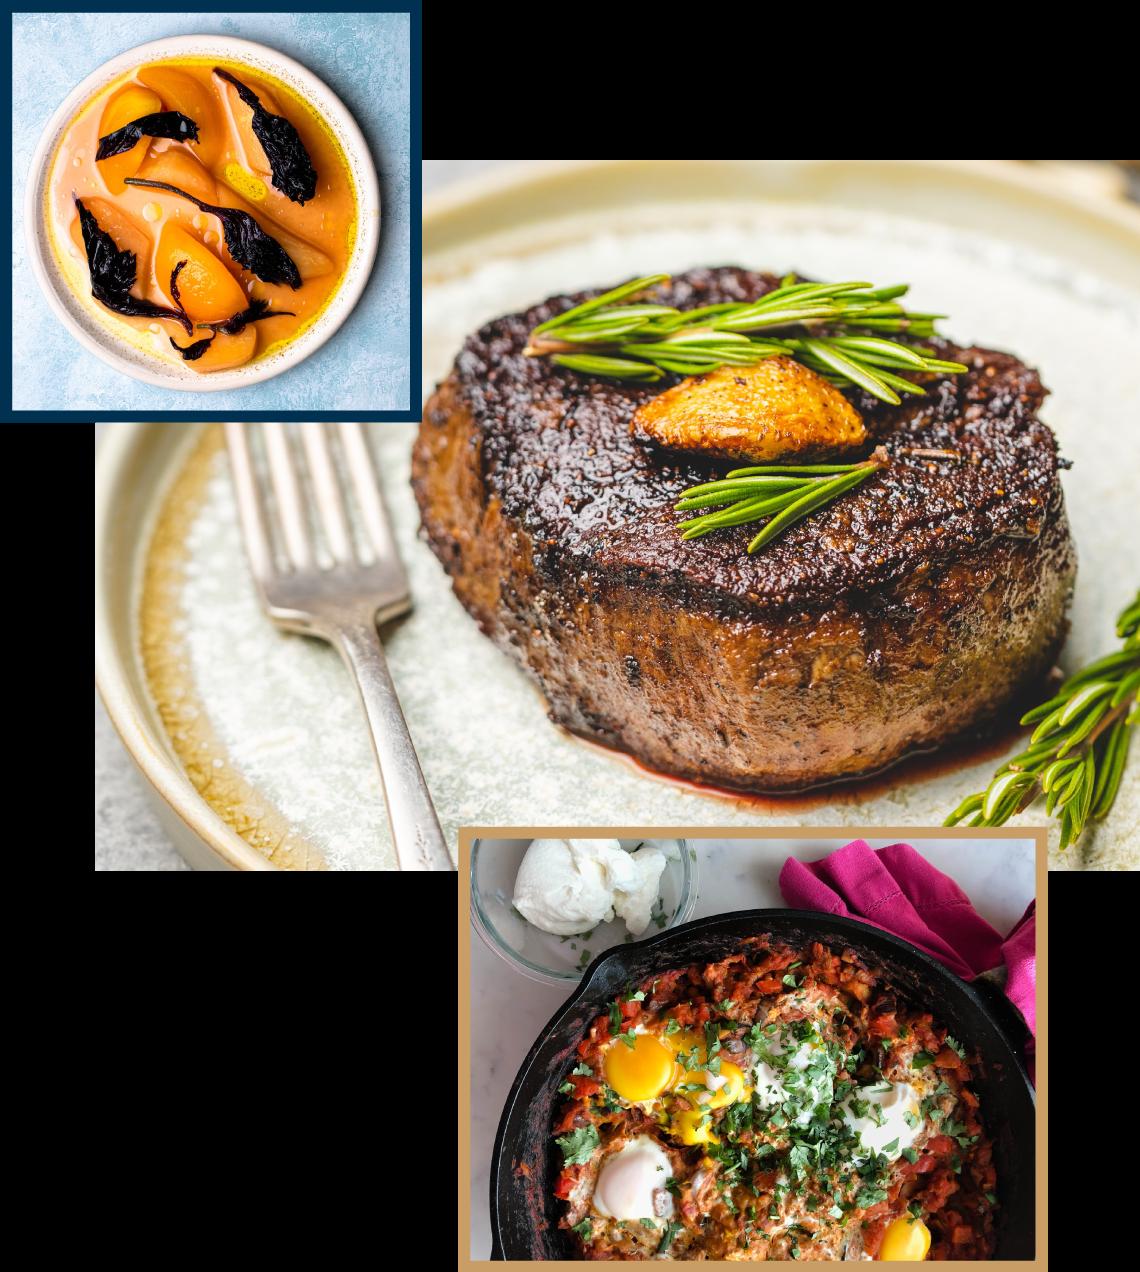 homepage-restaurant-image